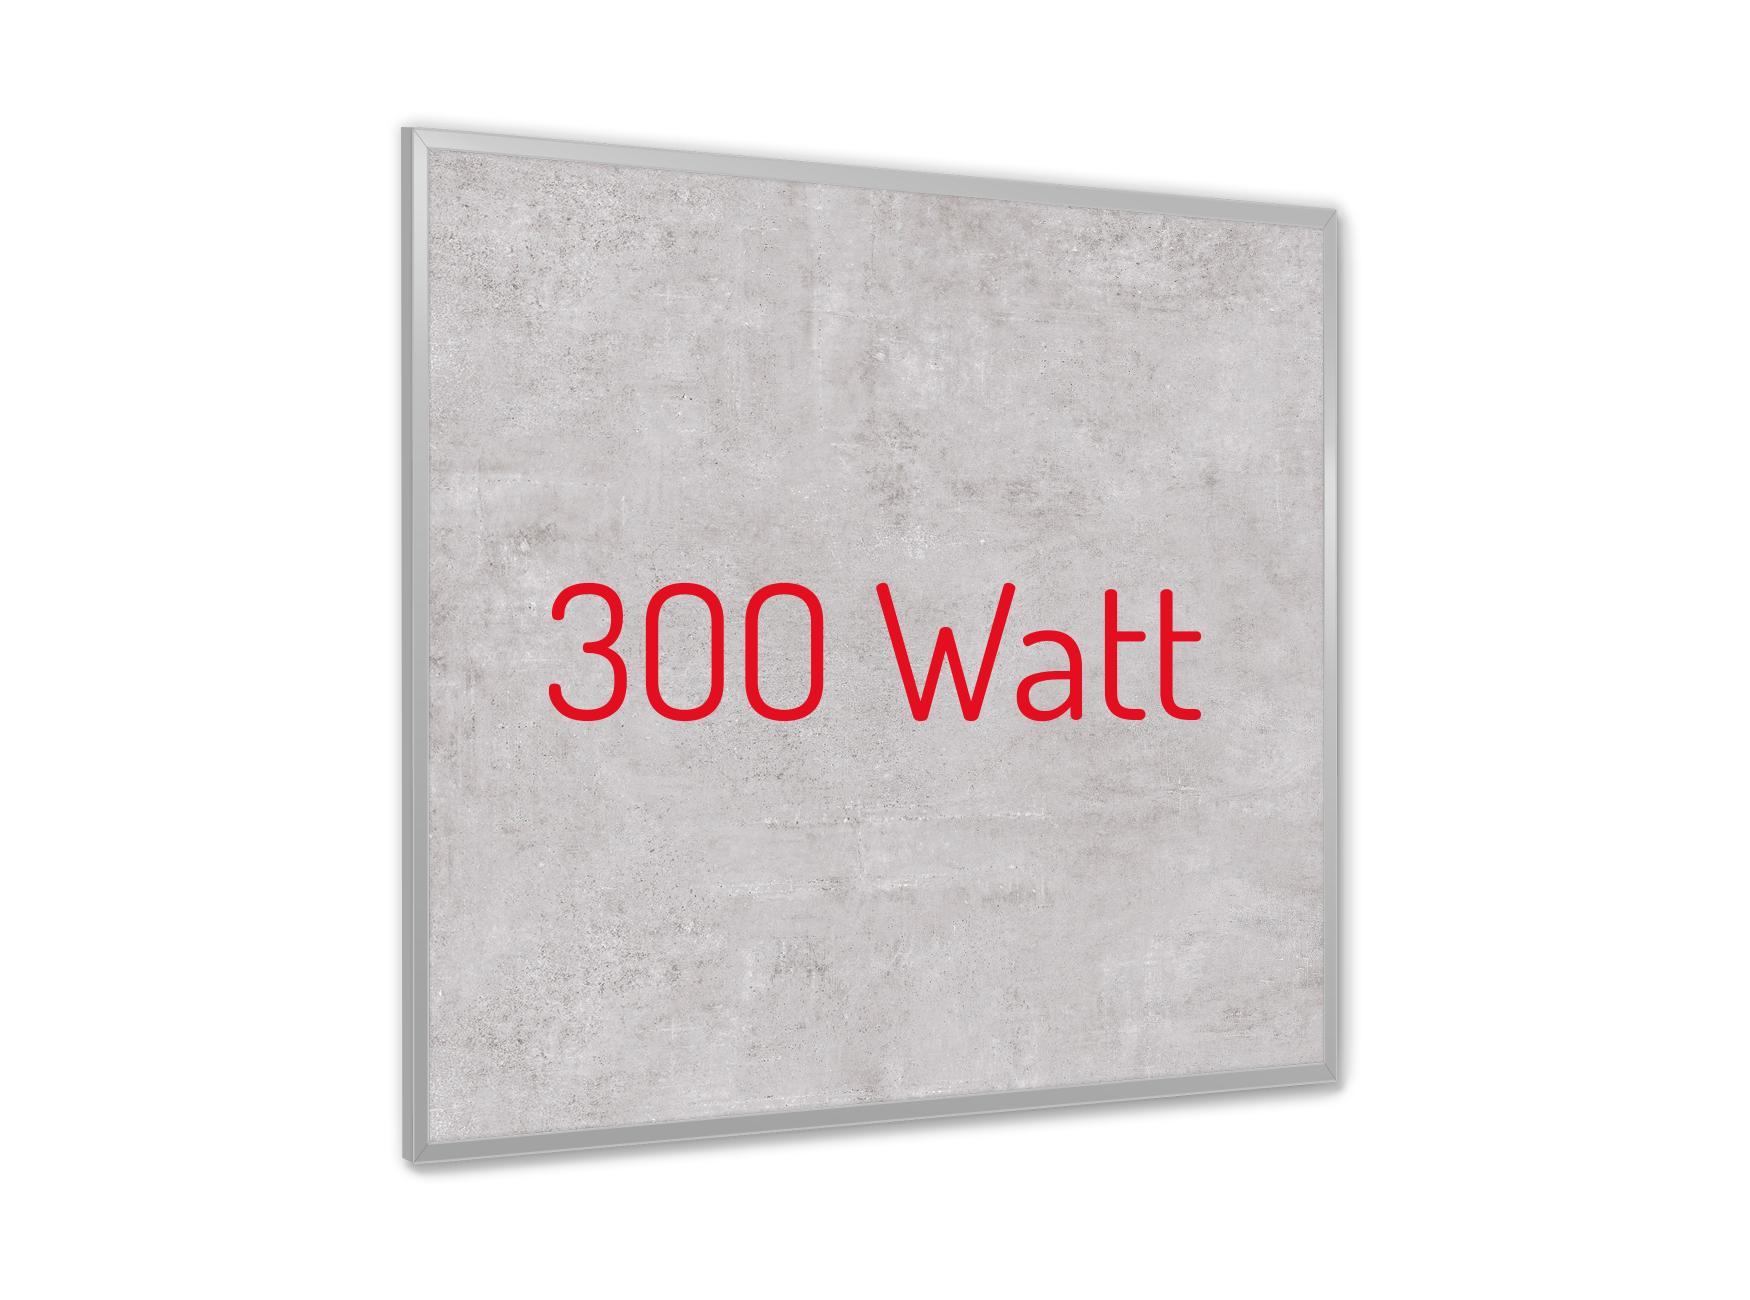 PowerSun Keramik Struktur Miami 300 Watt 60x60cm